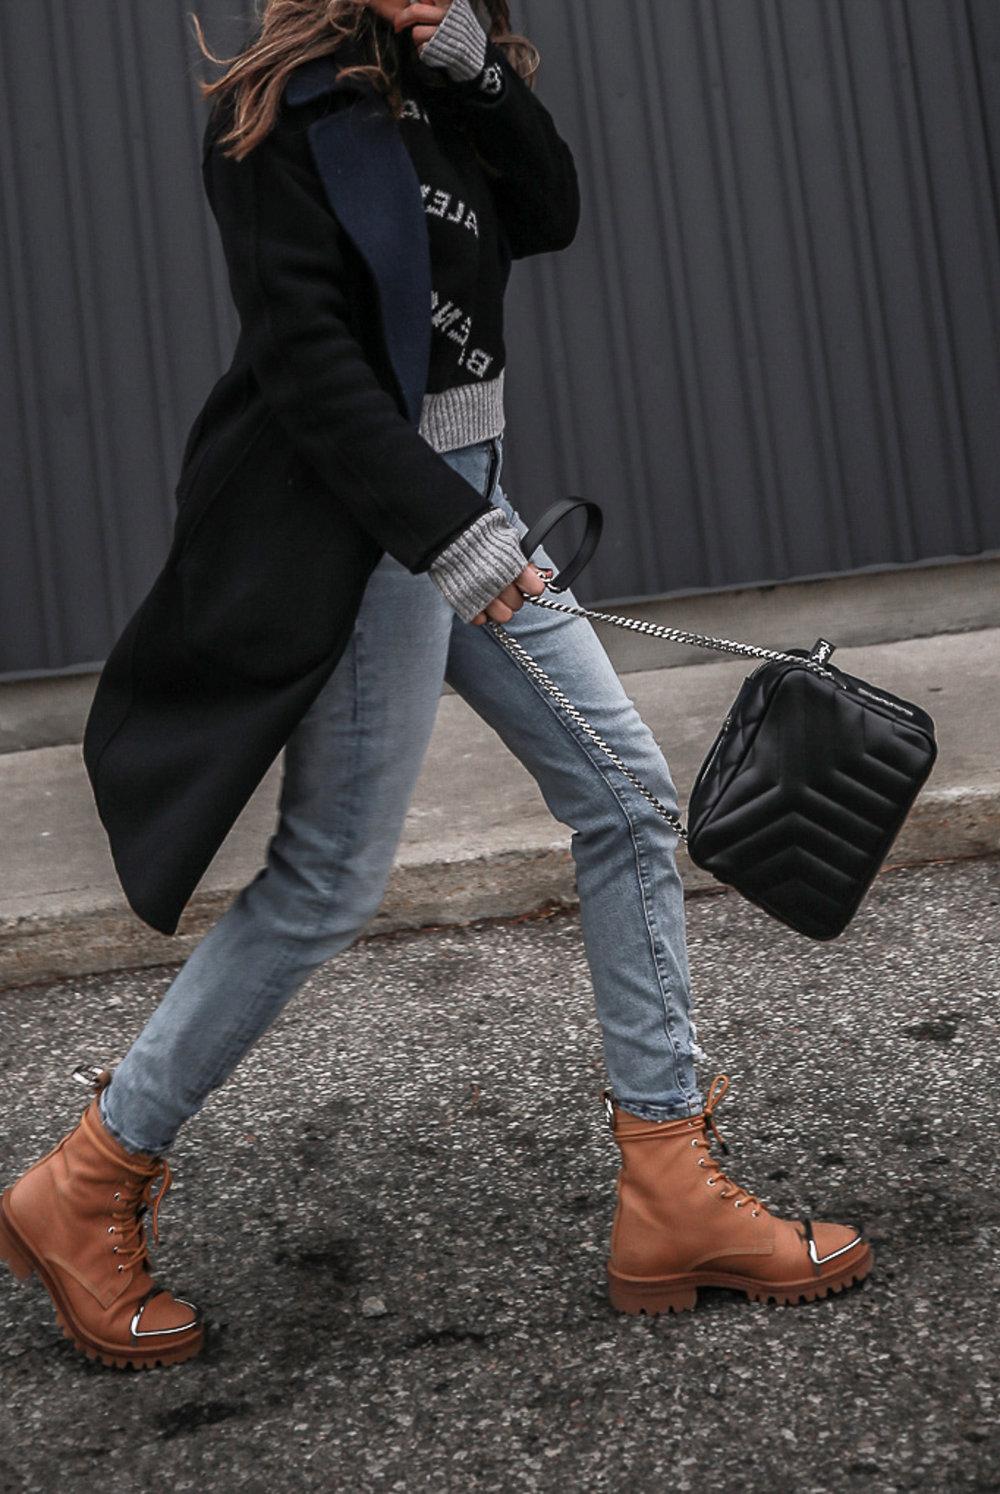 Nathalie Martin wearing Balenciaga black logo sweater, GRLFRND Denim Karolina jeans from Revolve, Saint Laurent LouLou small bowling bag, Alexander Wang Lyndon combat boots, Rag & Bone reversible wool coat, street style, woahstyle.com_4639.jpg